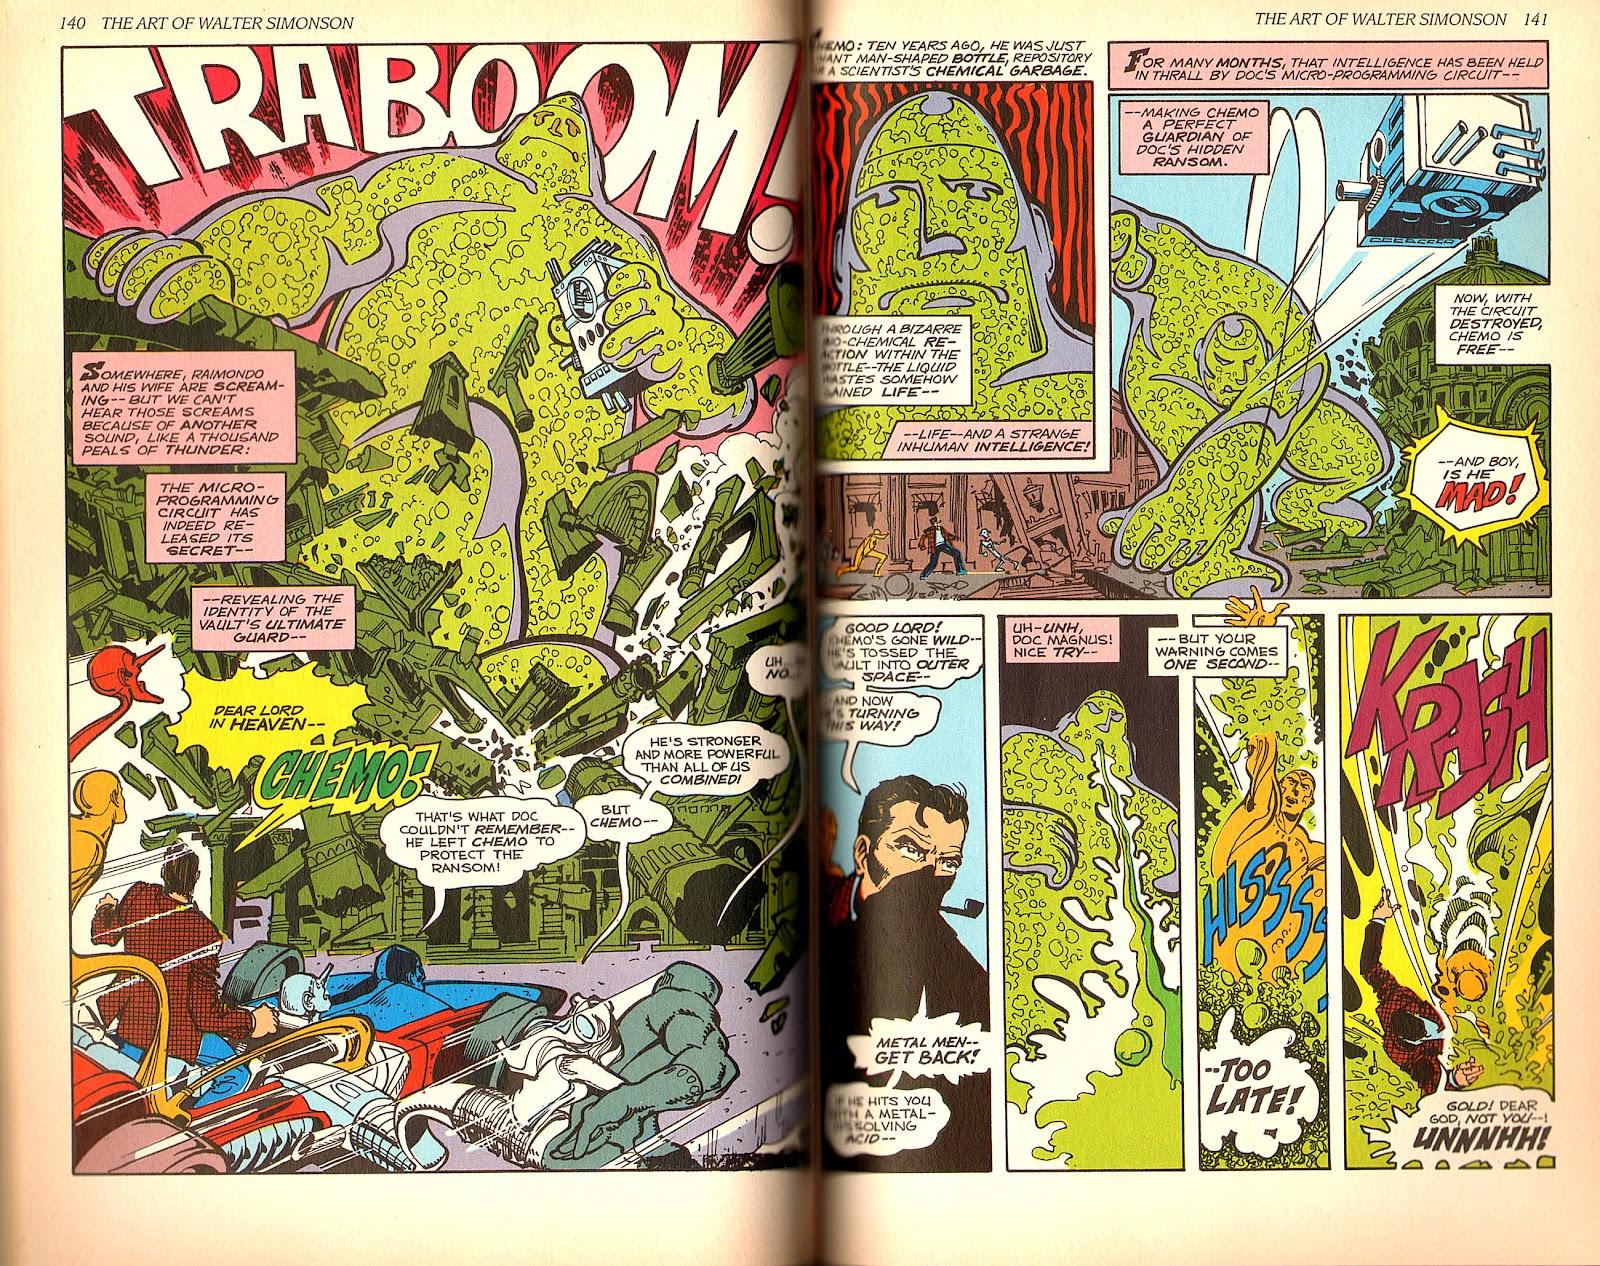 Read online The Art of Walter Simonson comic -  Issue # TPB - 72